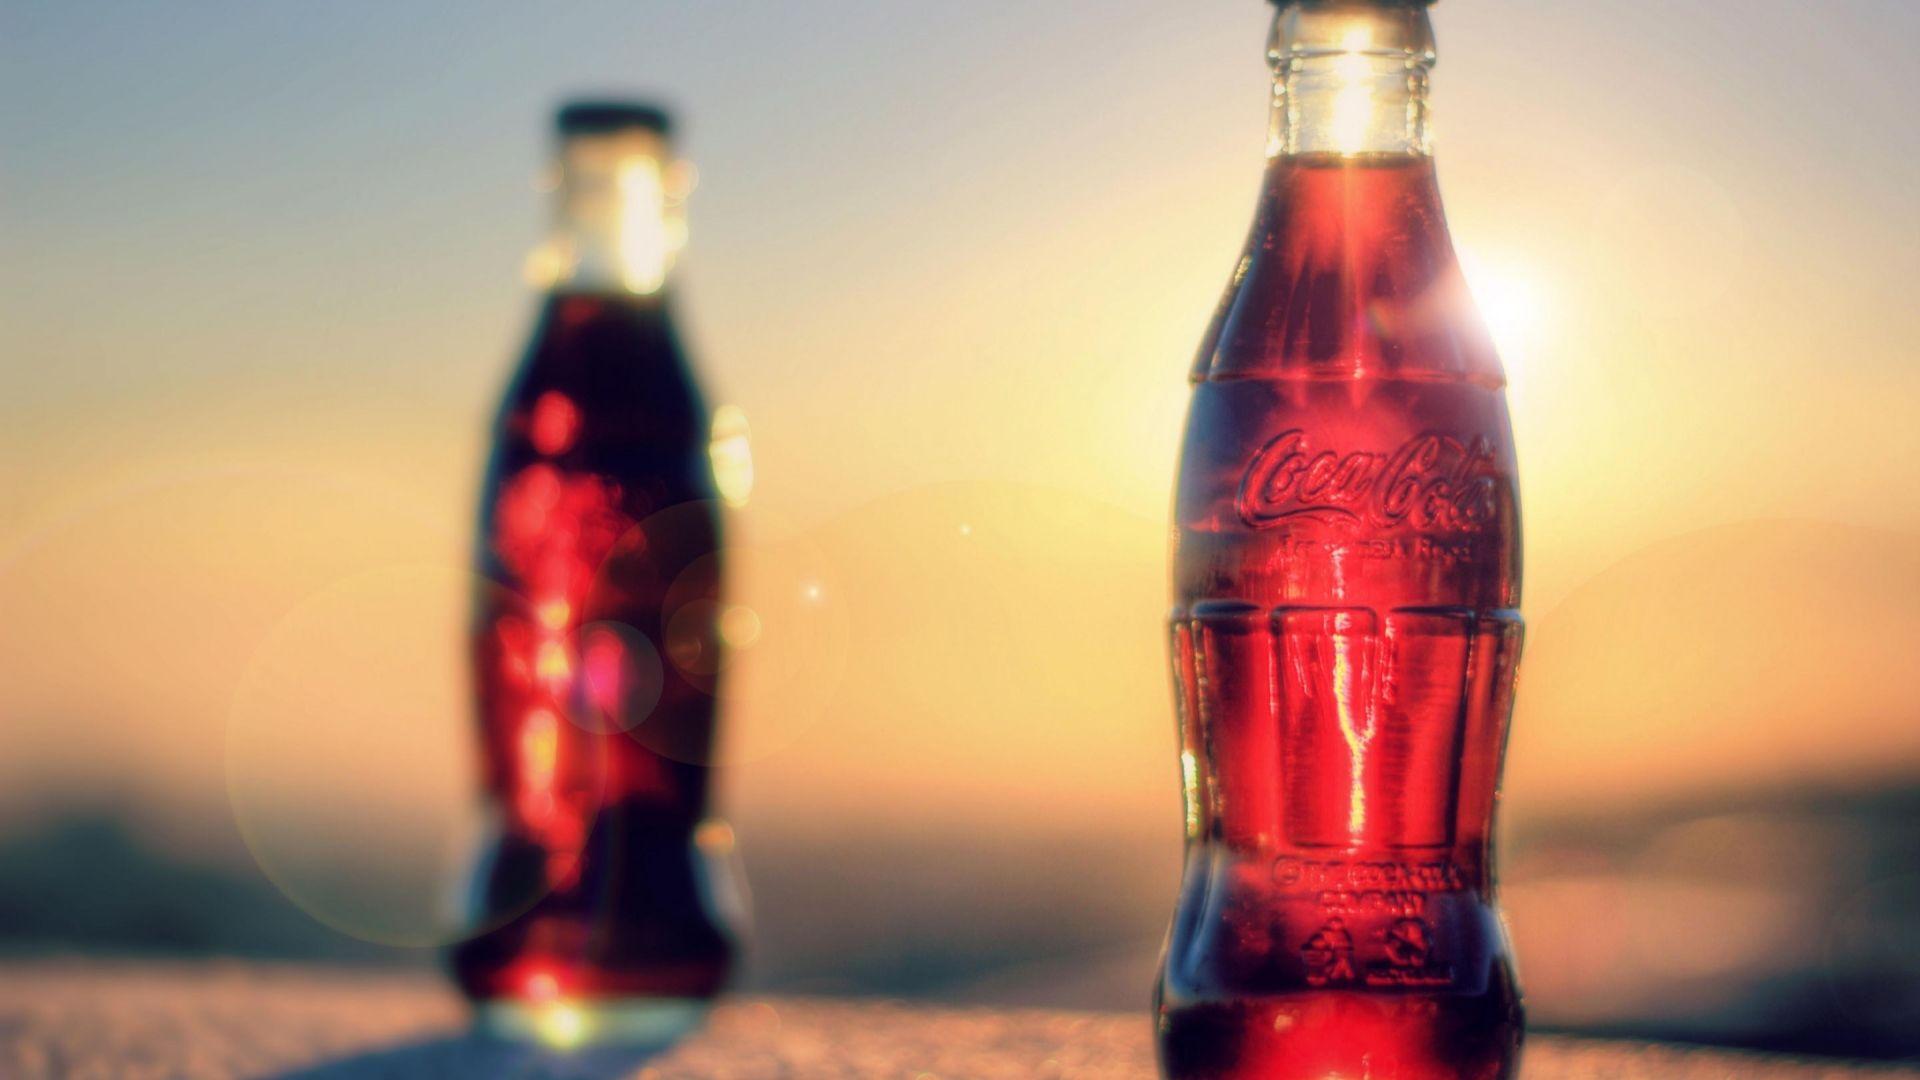 Coca Cola wallpaper photo full hd